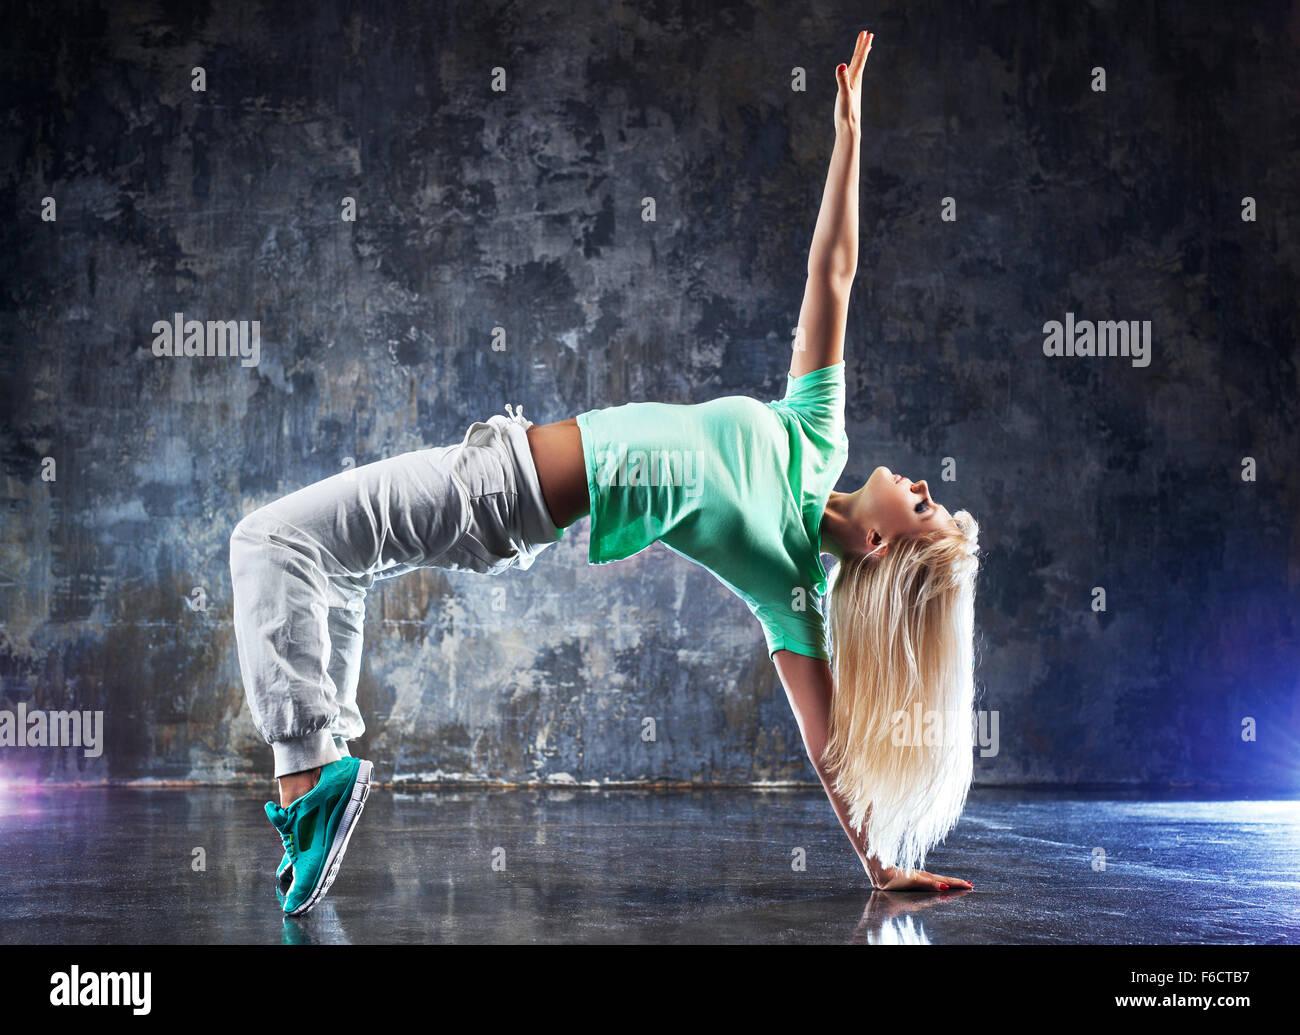 Joven bailarina moderna. En la pared de piedra oscura de fondo. Imagen De Stock